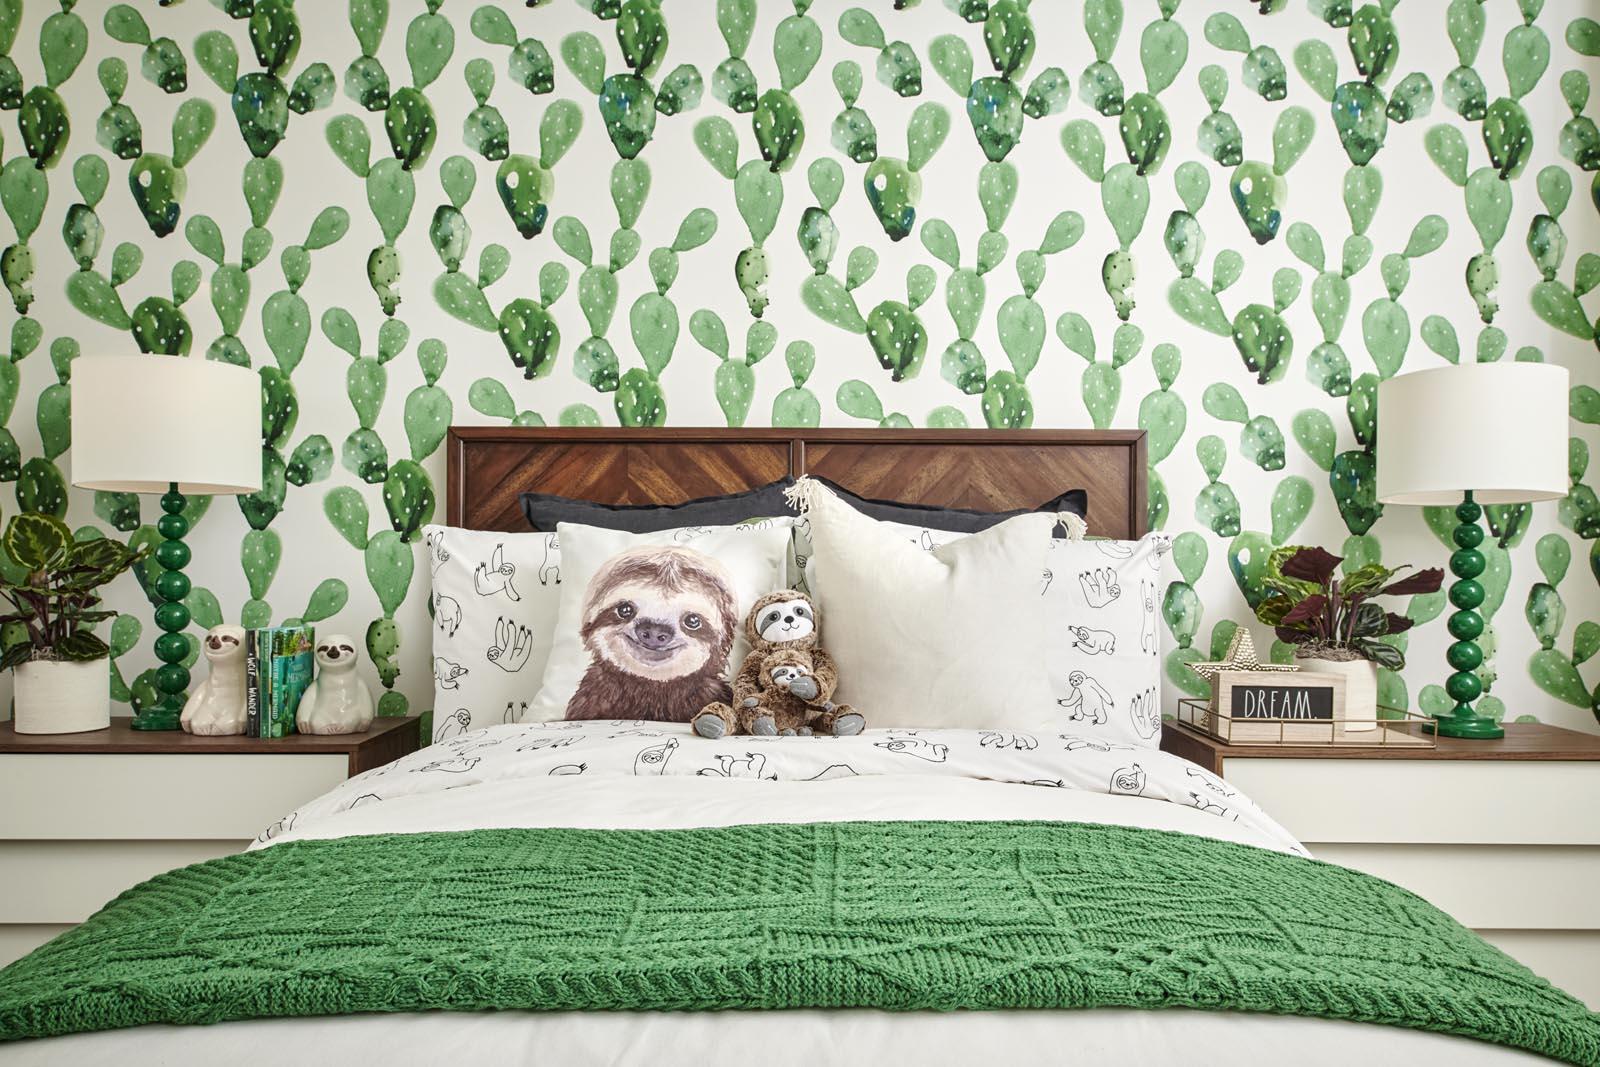 Bedroom   Residence 3   Enliven   New Homes in Rancho Cucamonga, CA   Van Daele Homes